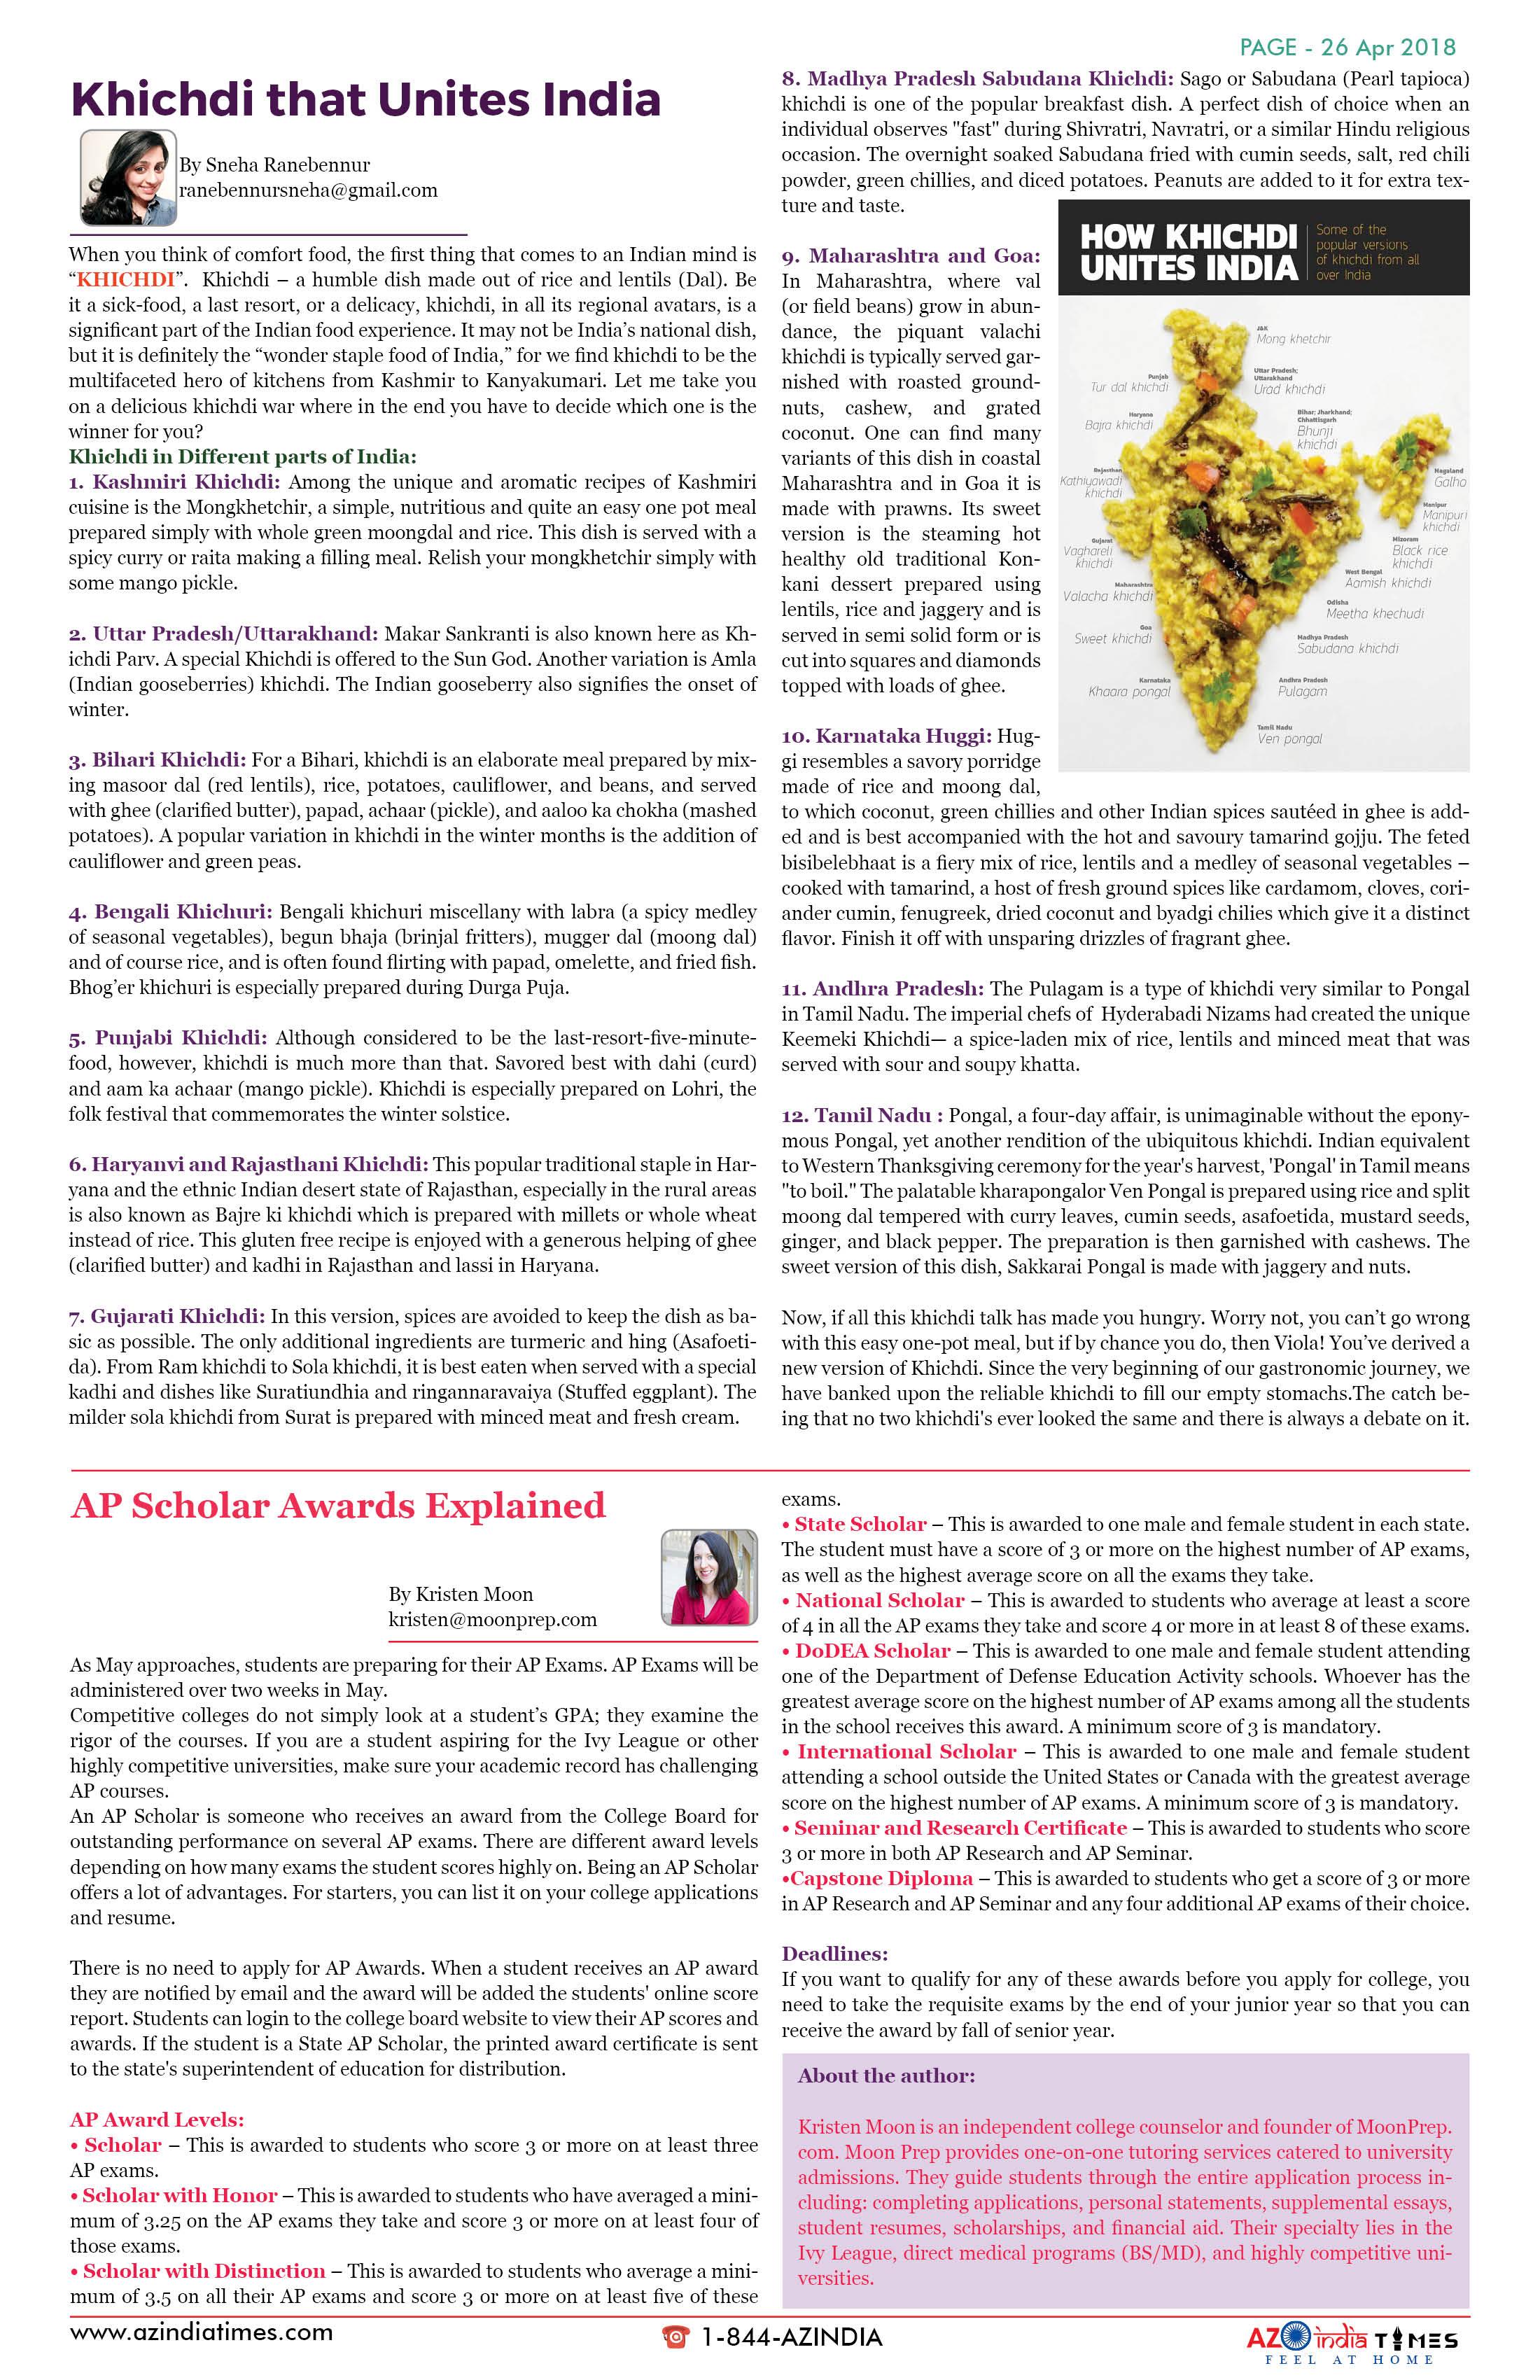 AZ INDIA APRIL EDITION 26